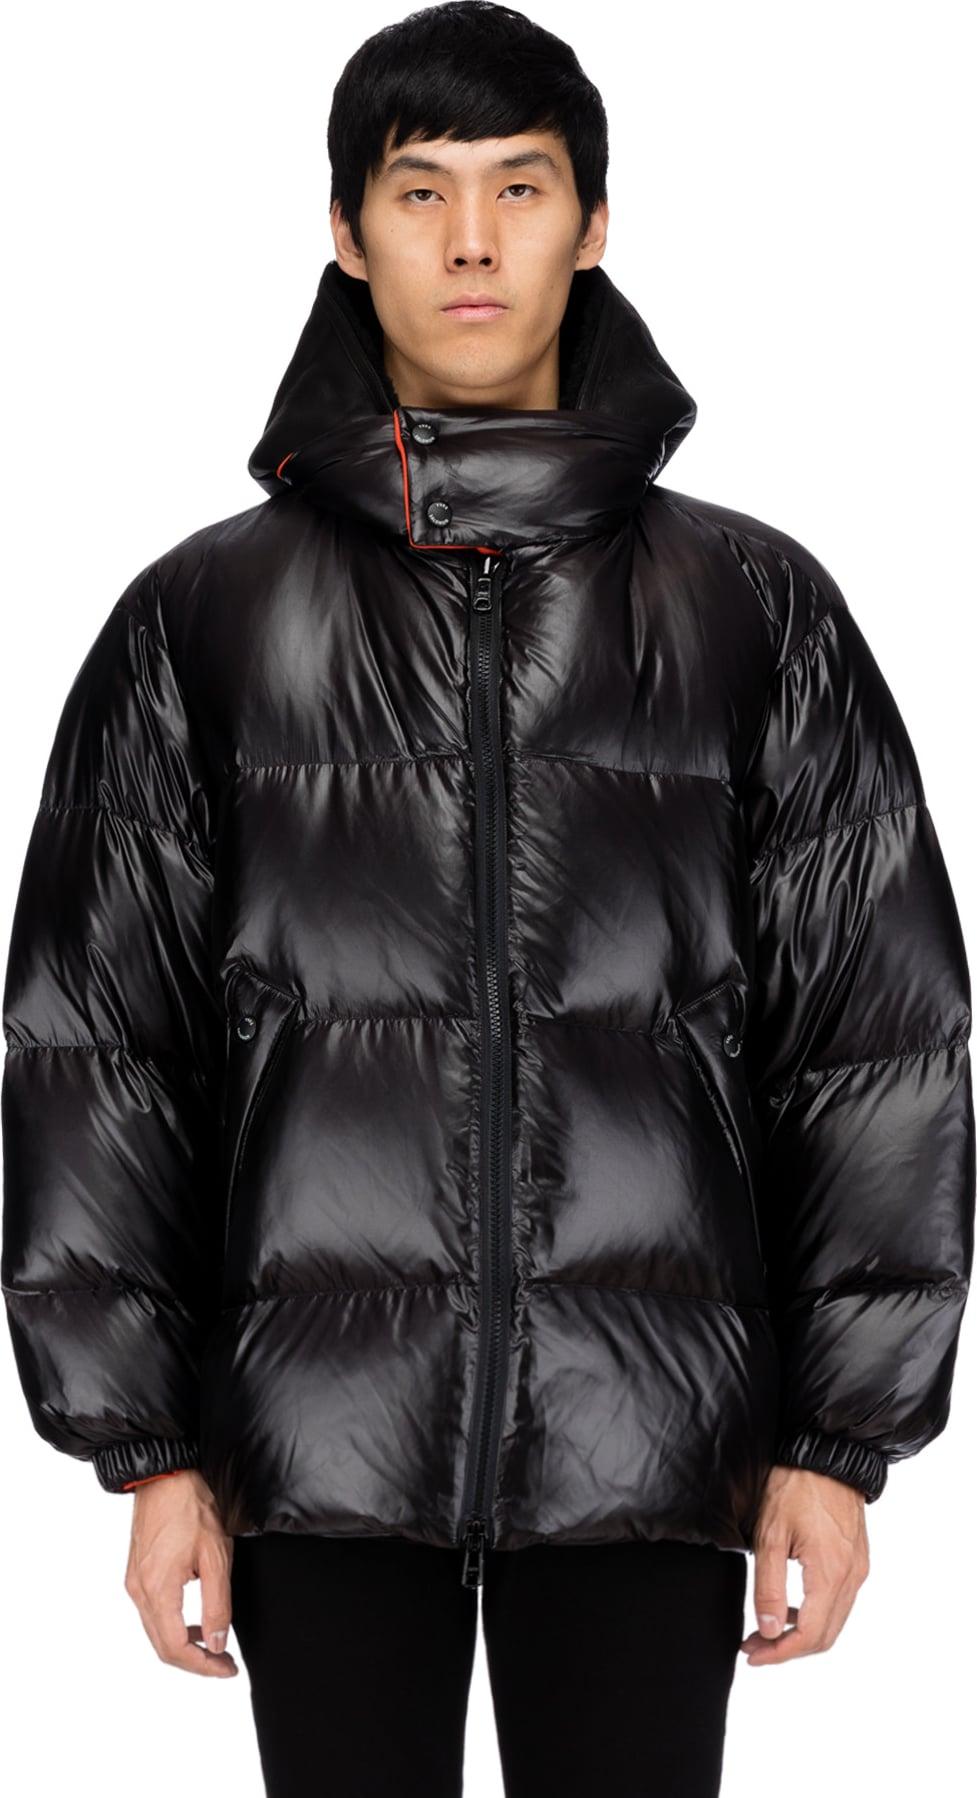 Orange Oversized Jacket Down Hooded Blackrio Yves Salomon w1YAw8